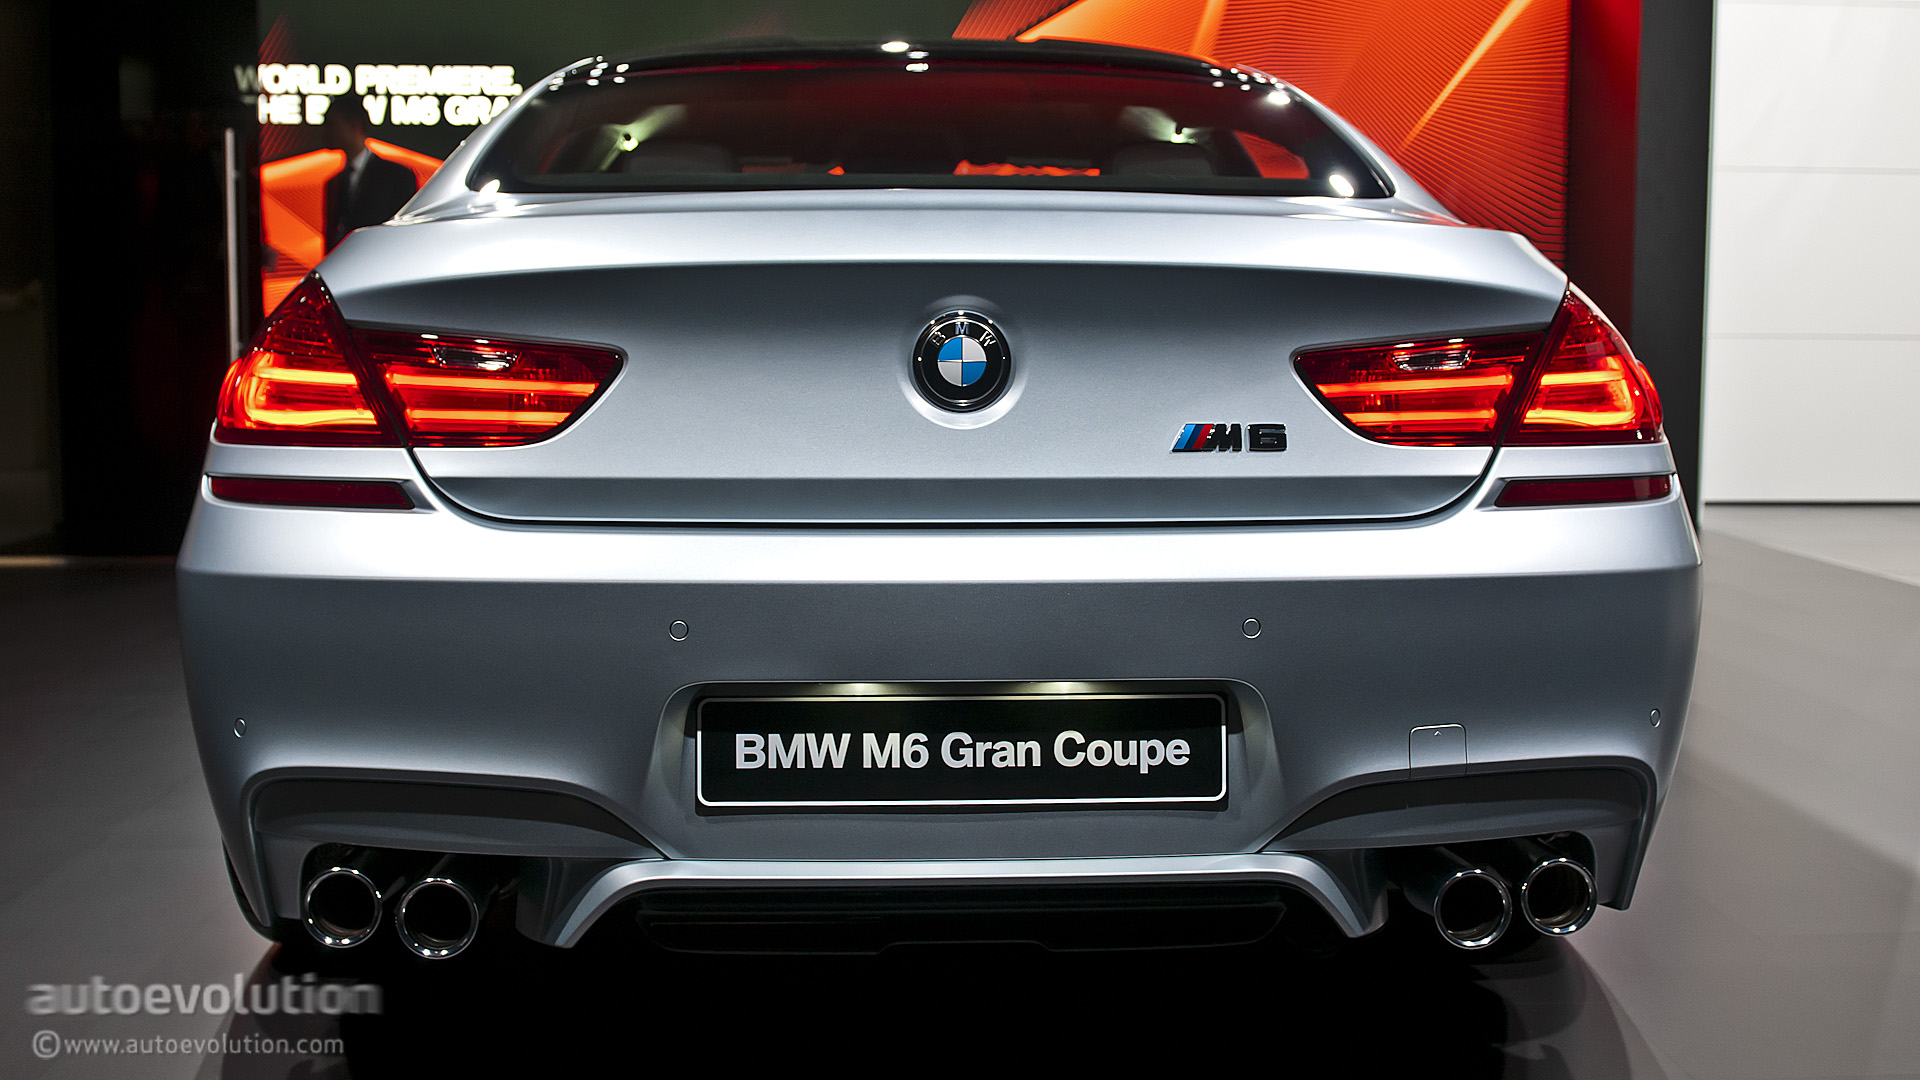 2013 naias bmw m6 gran coupe